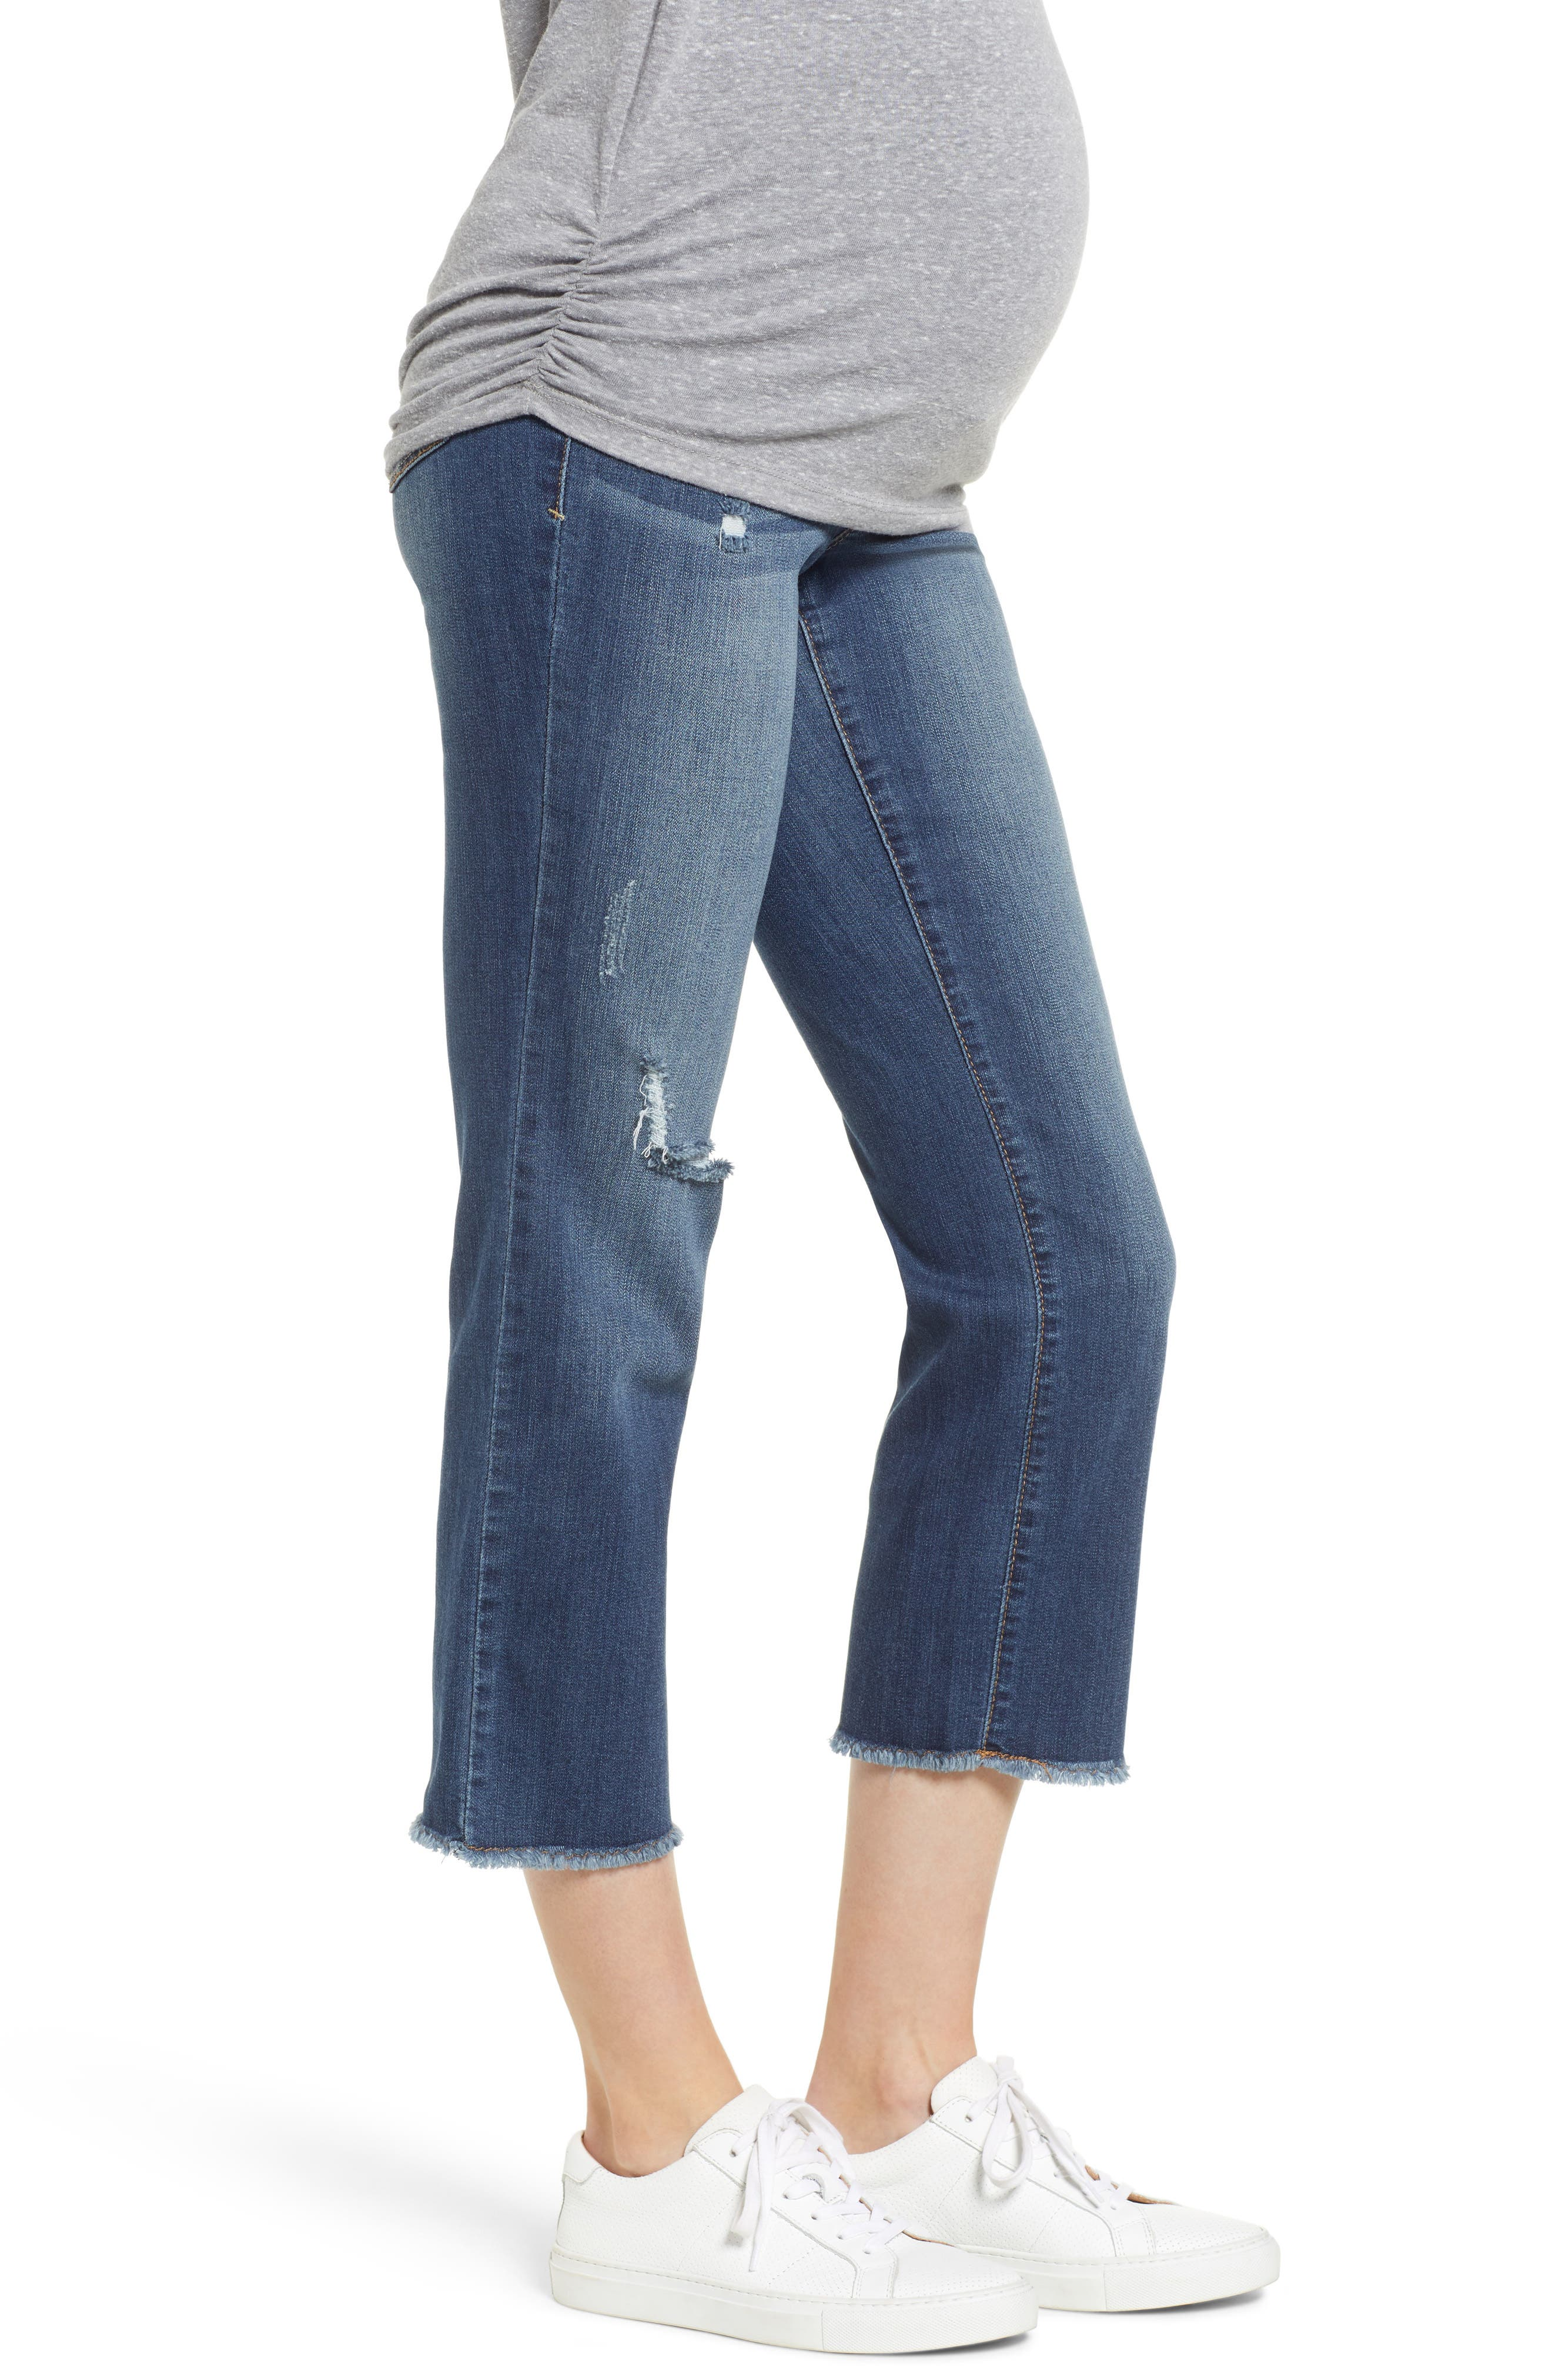 Cassie Crop Straight Leg Maternity Jeans,                             Alternate thumbnail 3, color,                             CASSIE